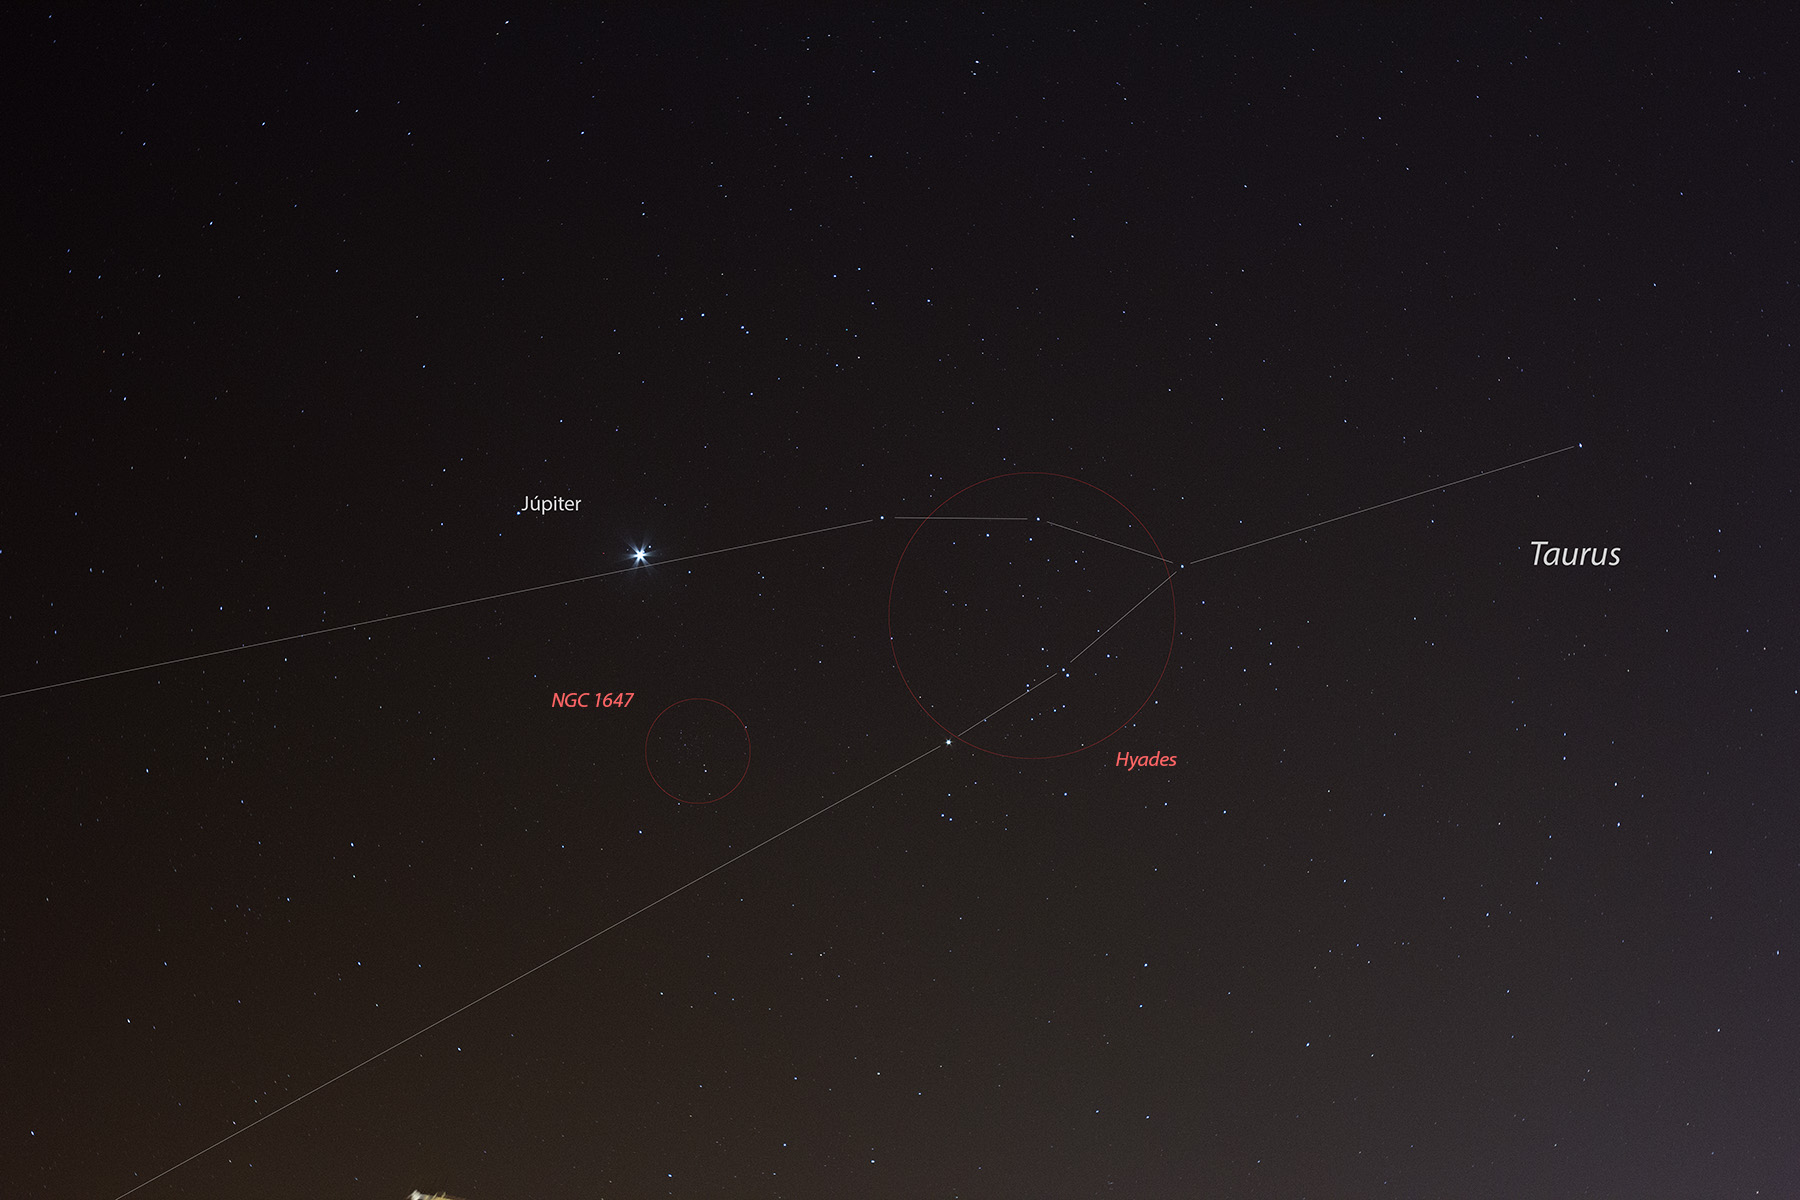 Júpiter a Taurus